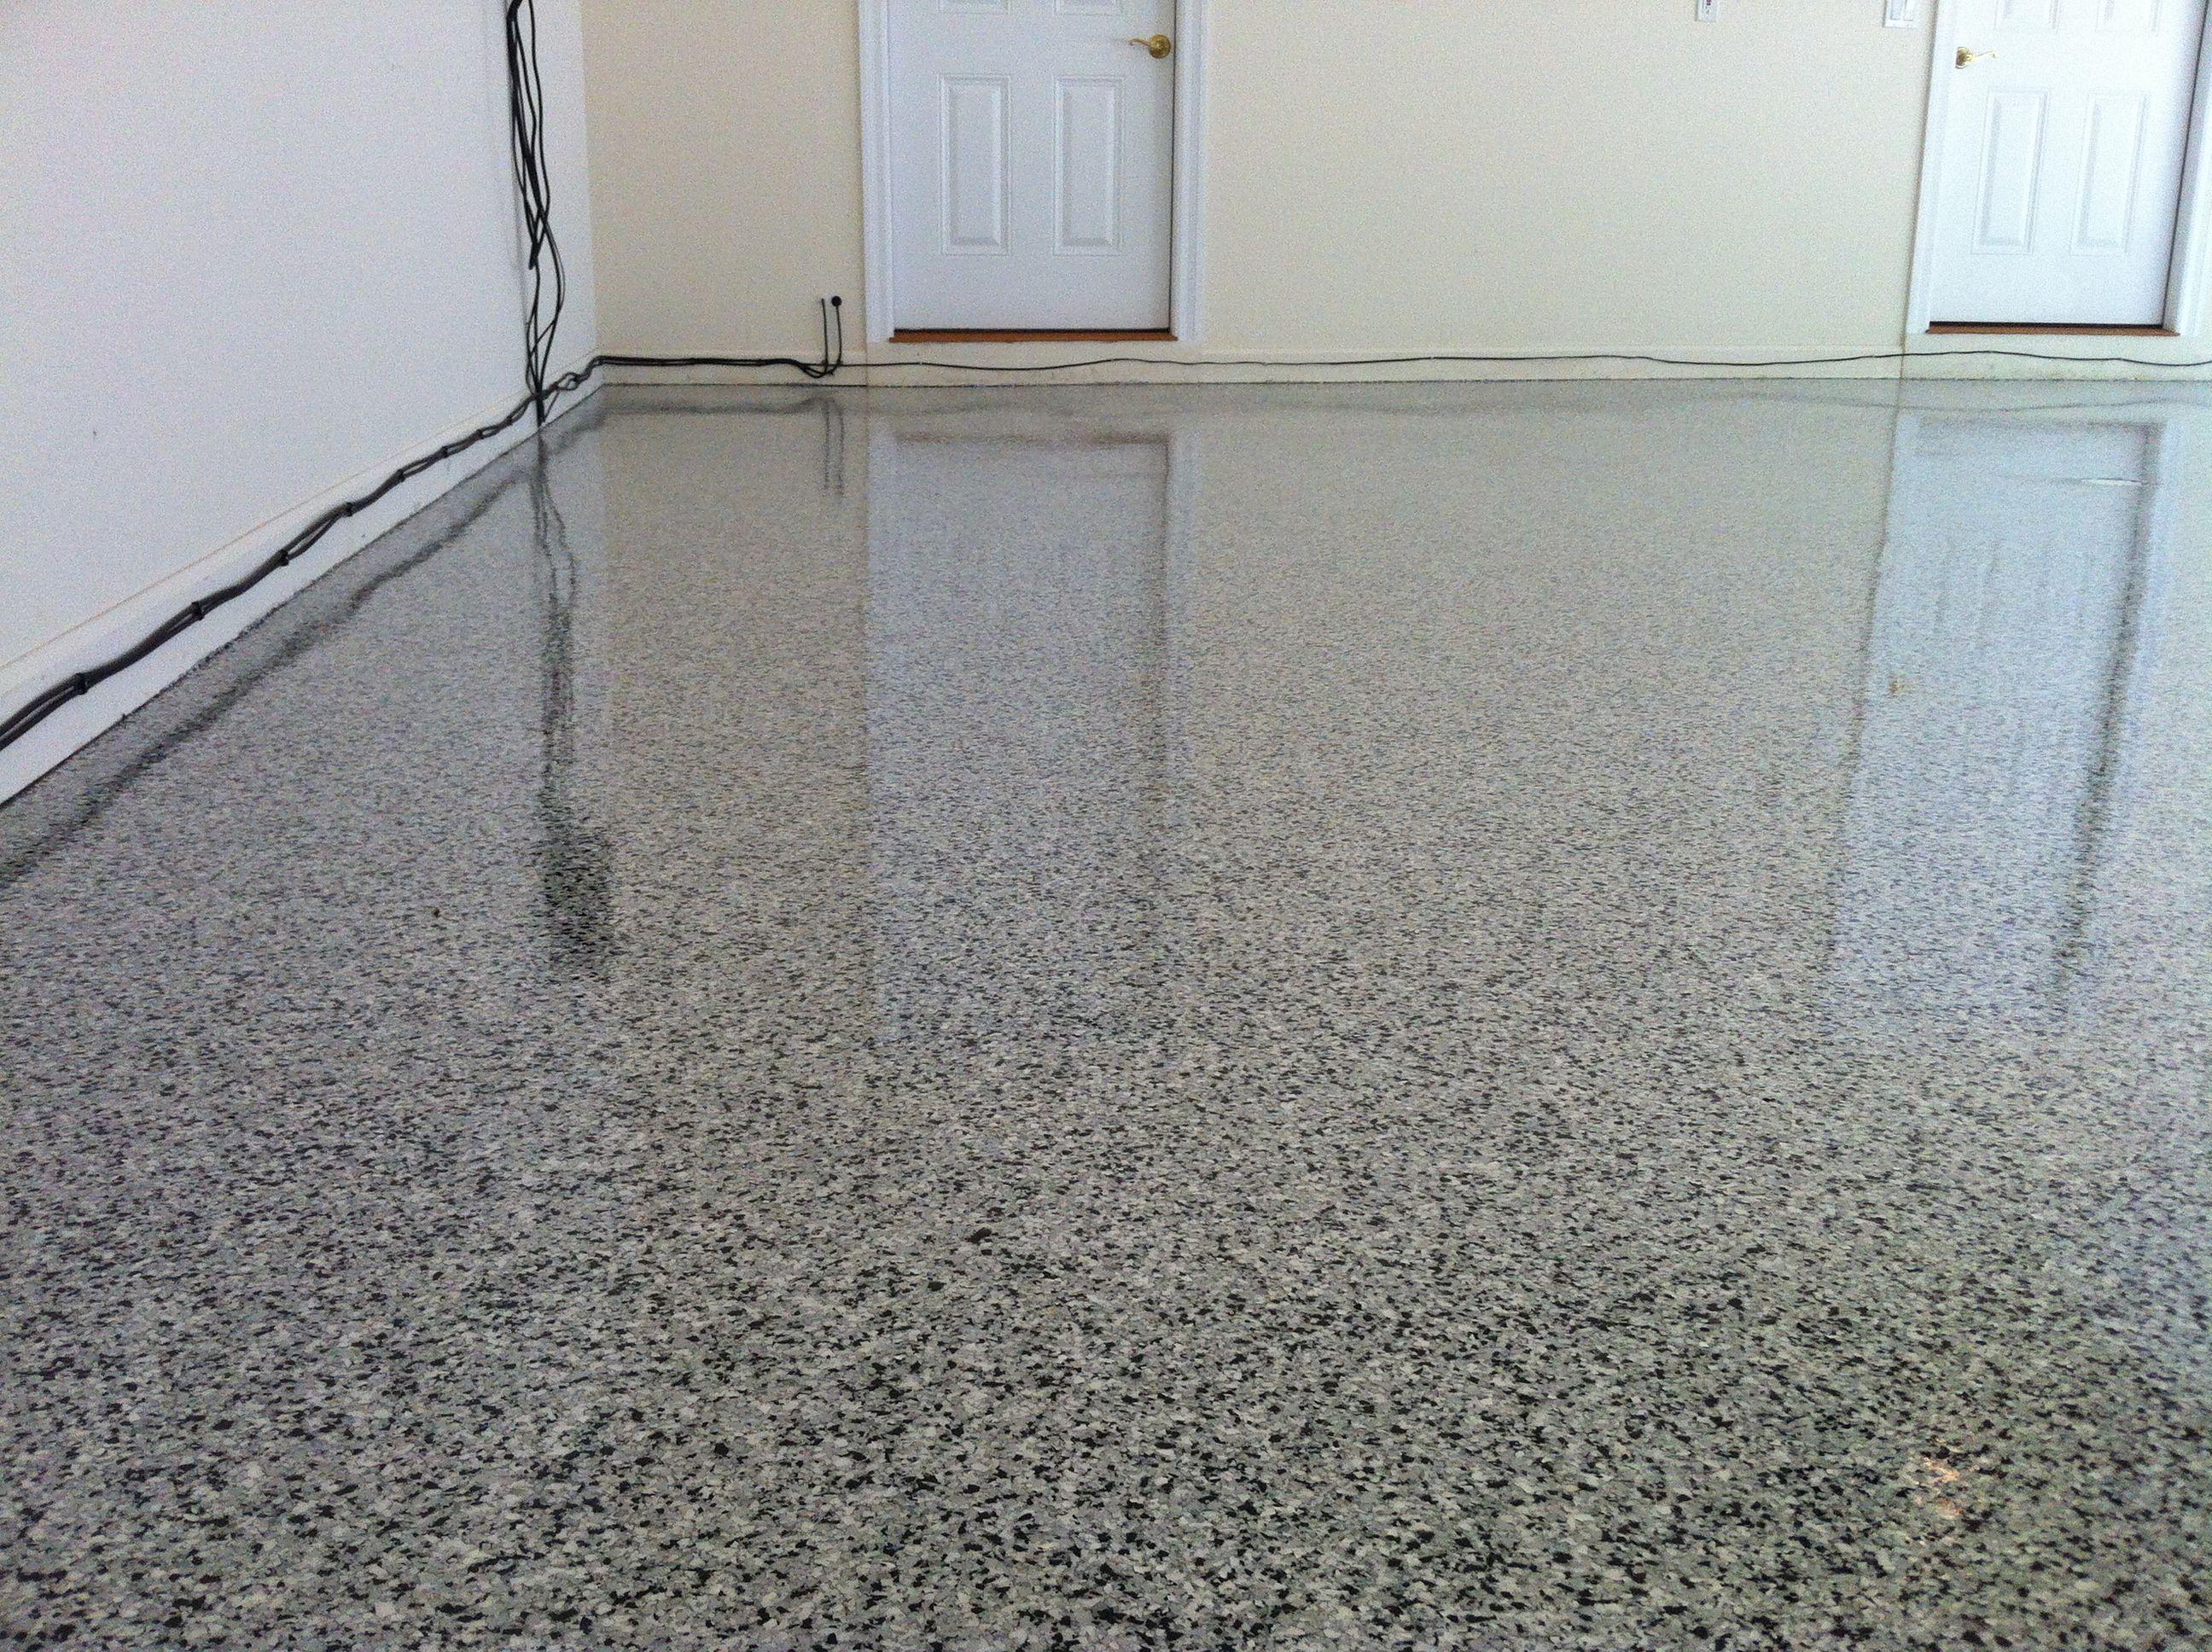 Decorative Garage Floor Coatings : Decorative concrete overlay epoxy garage floor lake ozark